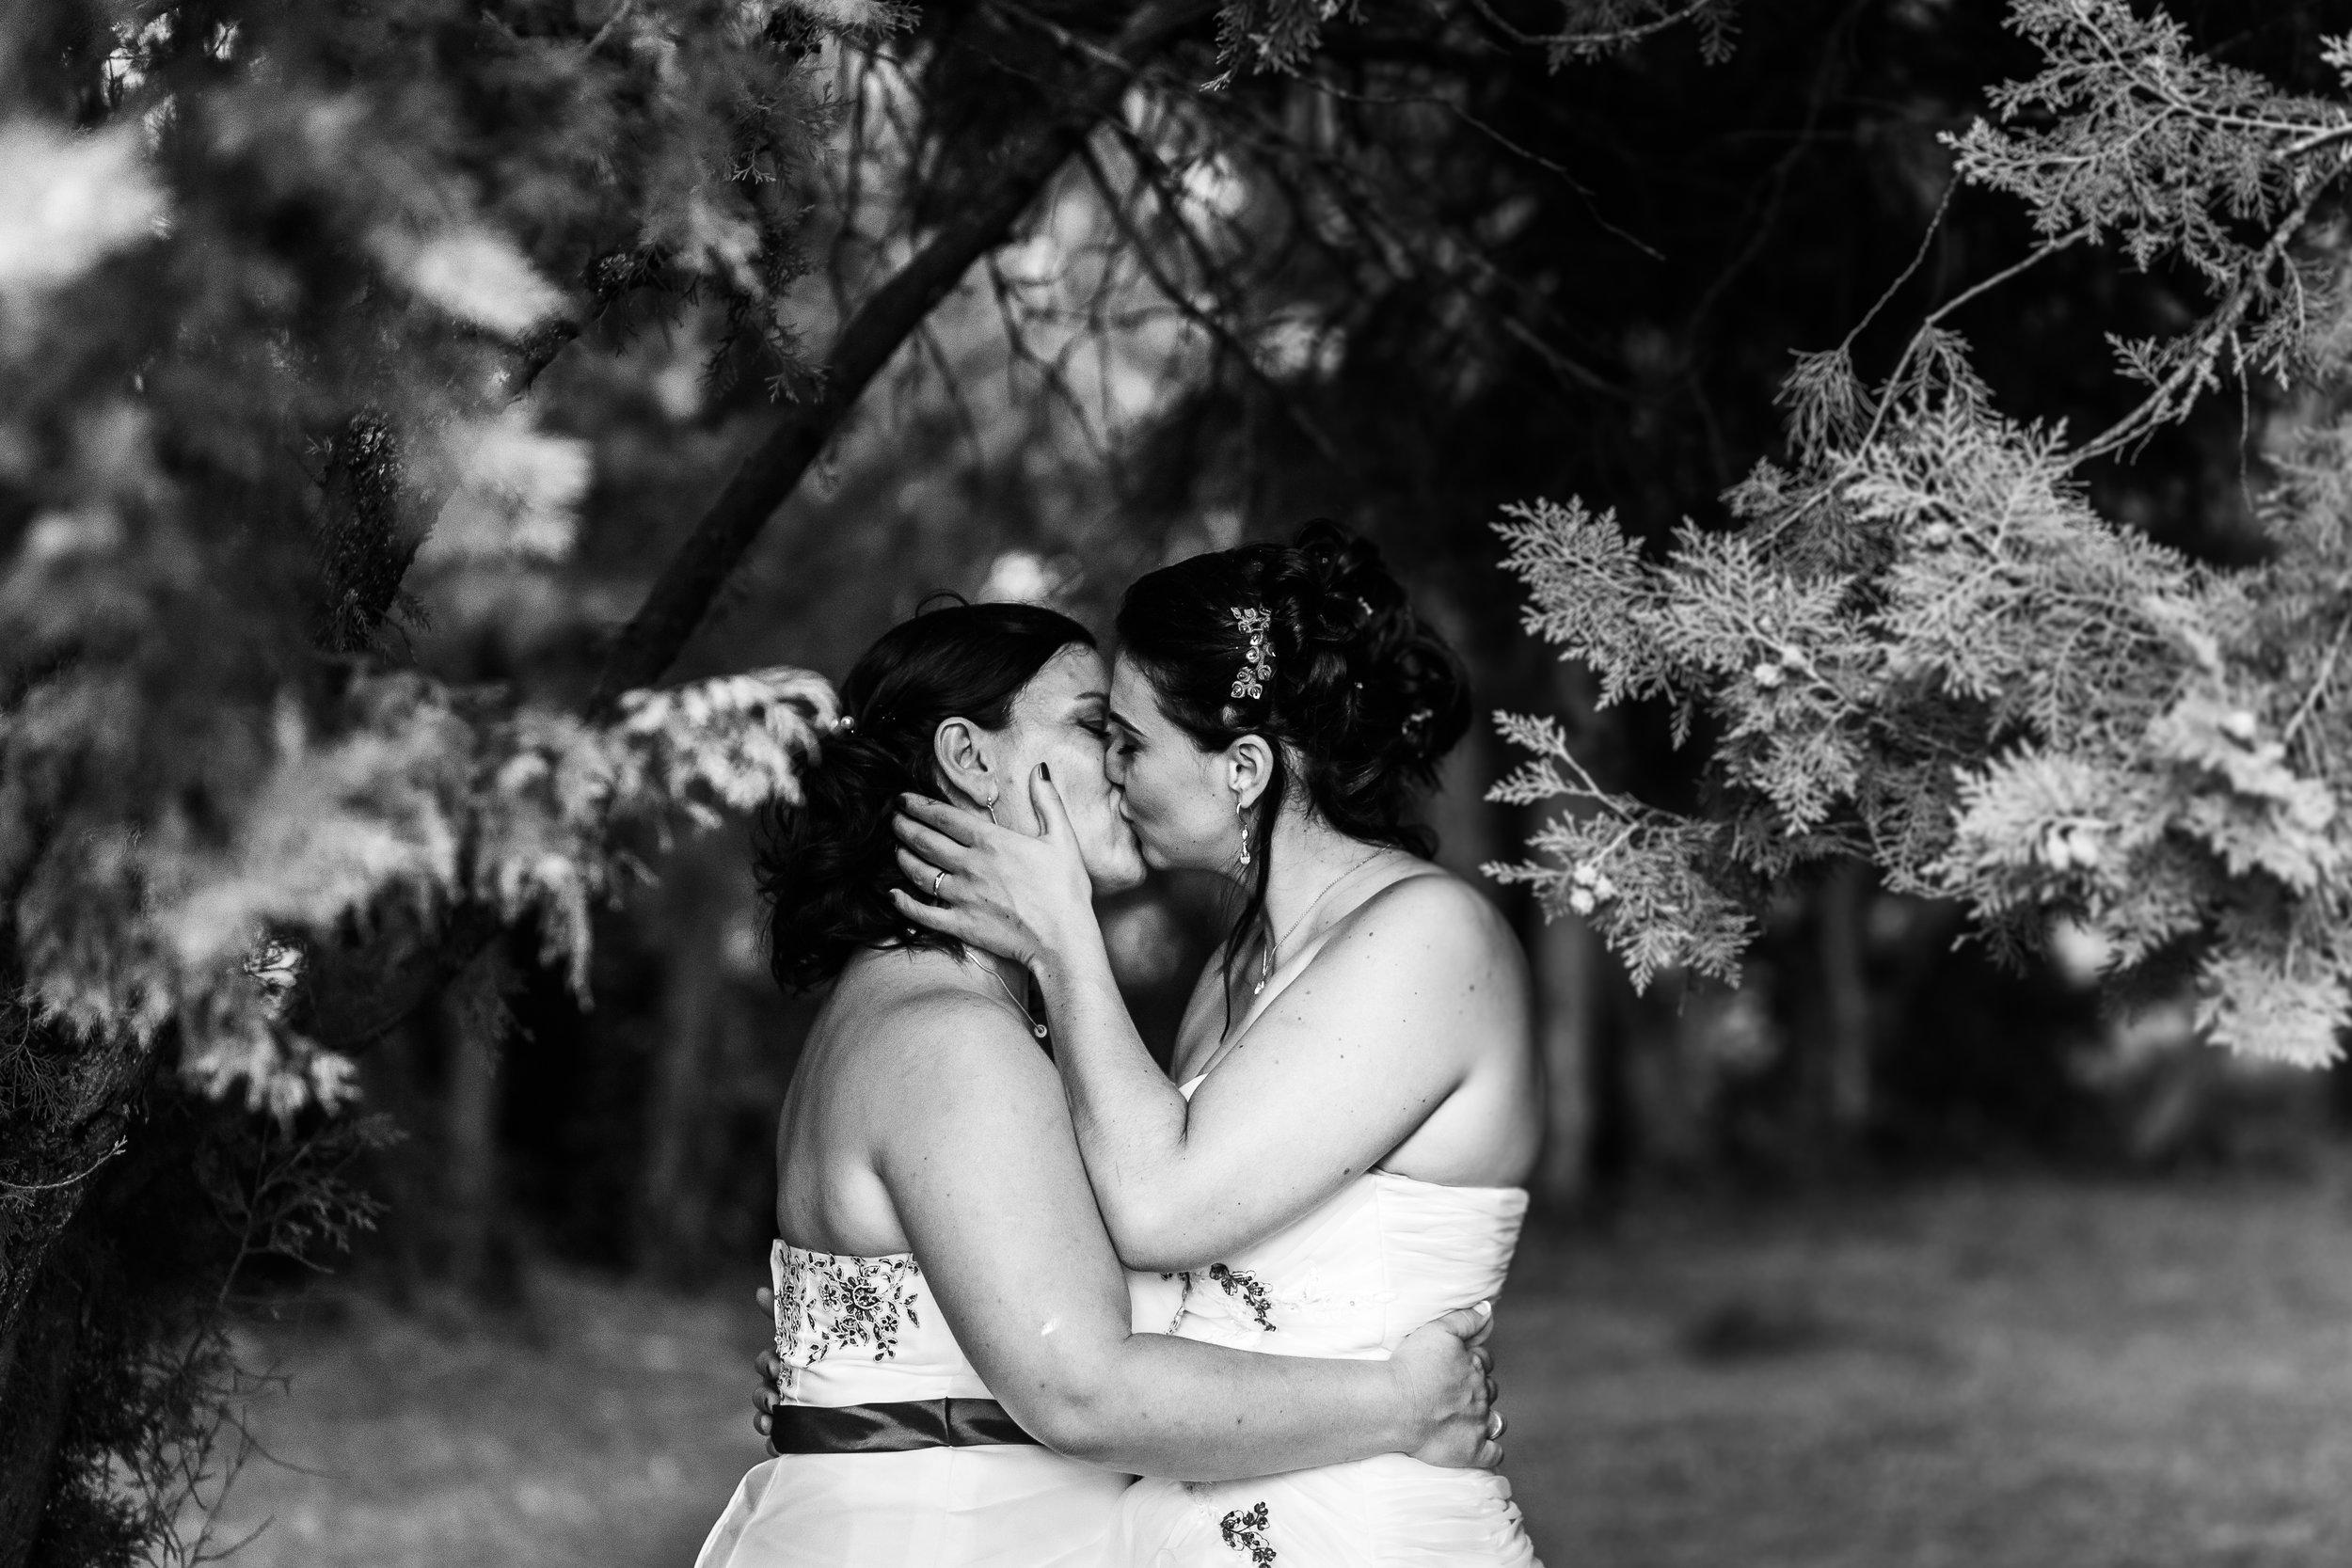 2019-06-07-MAR_Lorine_&_Sylvie_fav-74.jpg